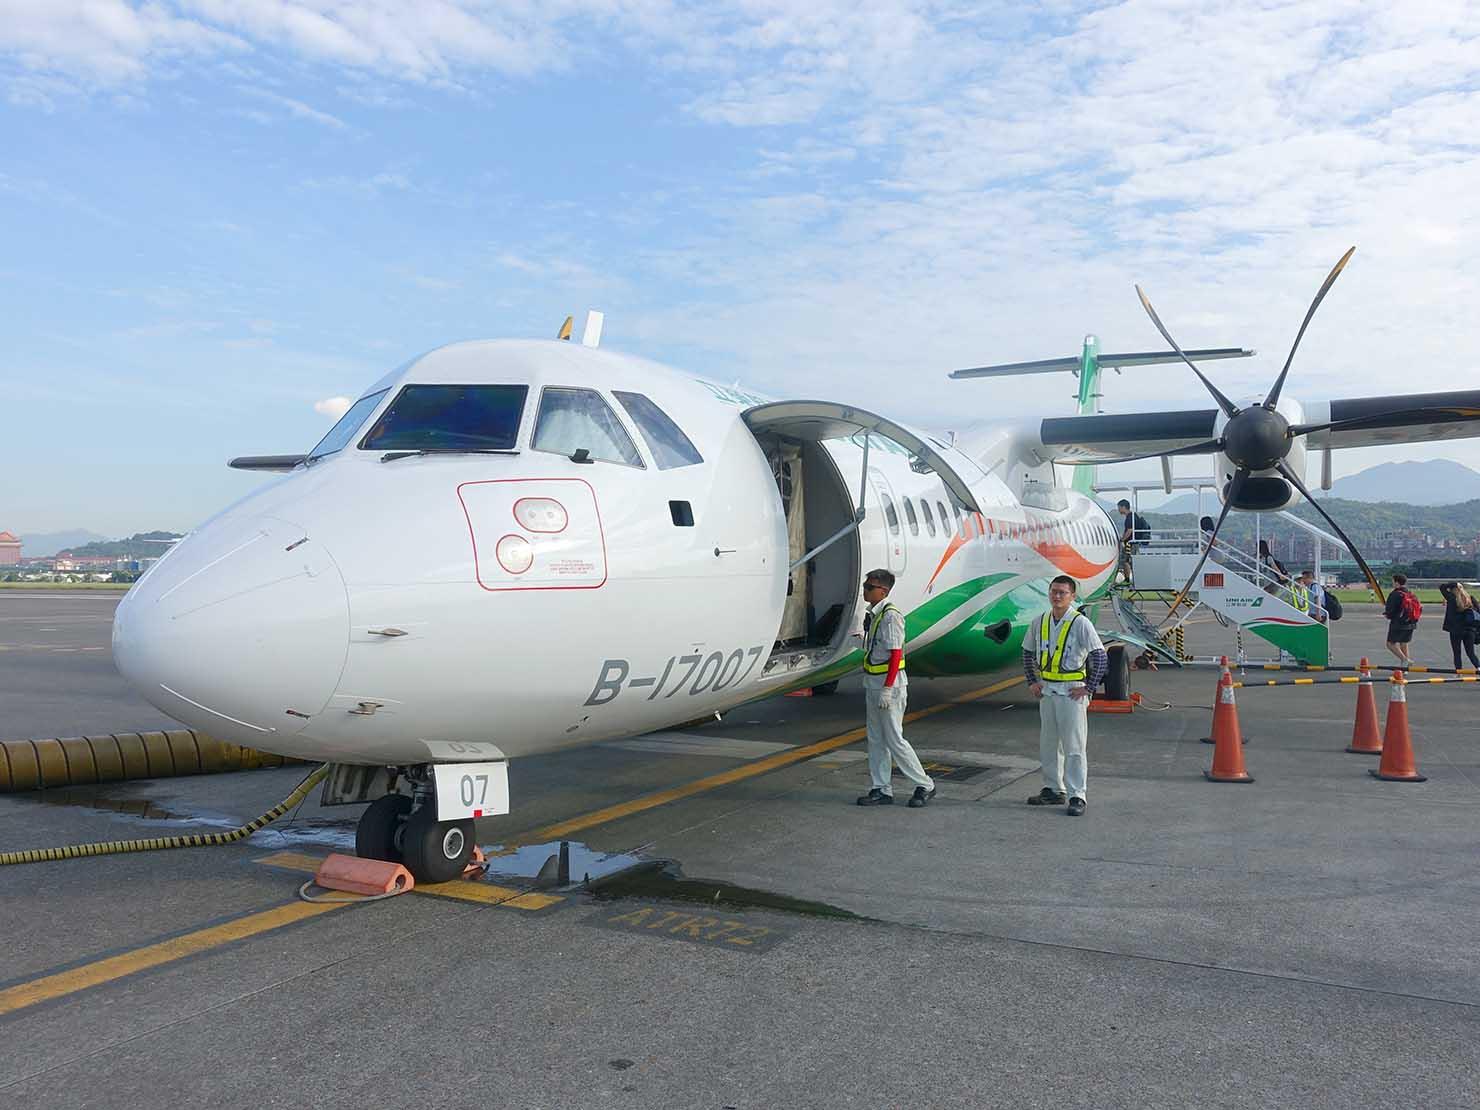 KKday外国人限定「花蓮・太魯閣(タロコ)日帰りツアー」台北・松山空港から出発する立榮航空(UNI AIR)の飛行機